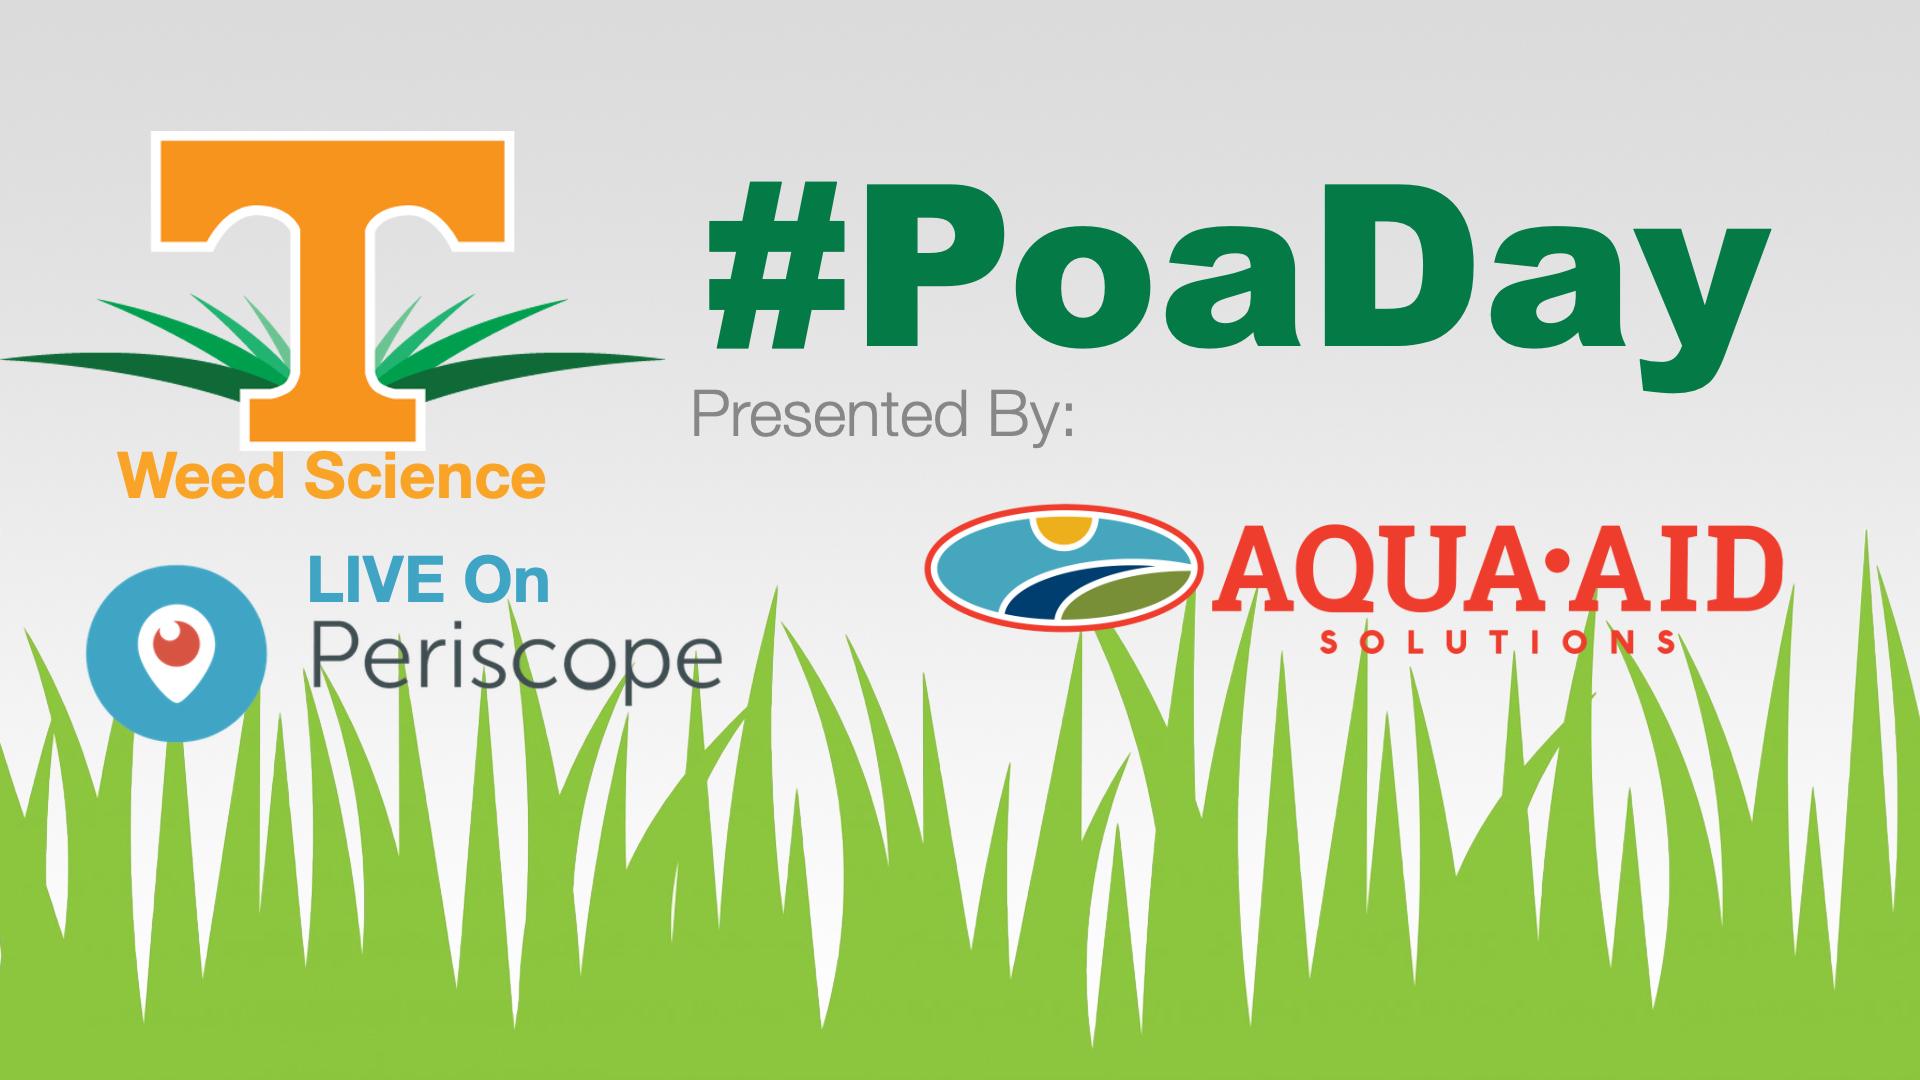 2019 Poa Day